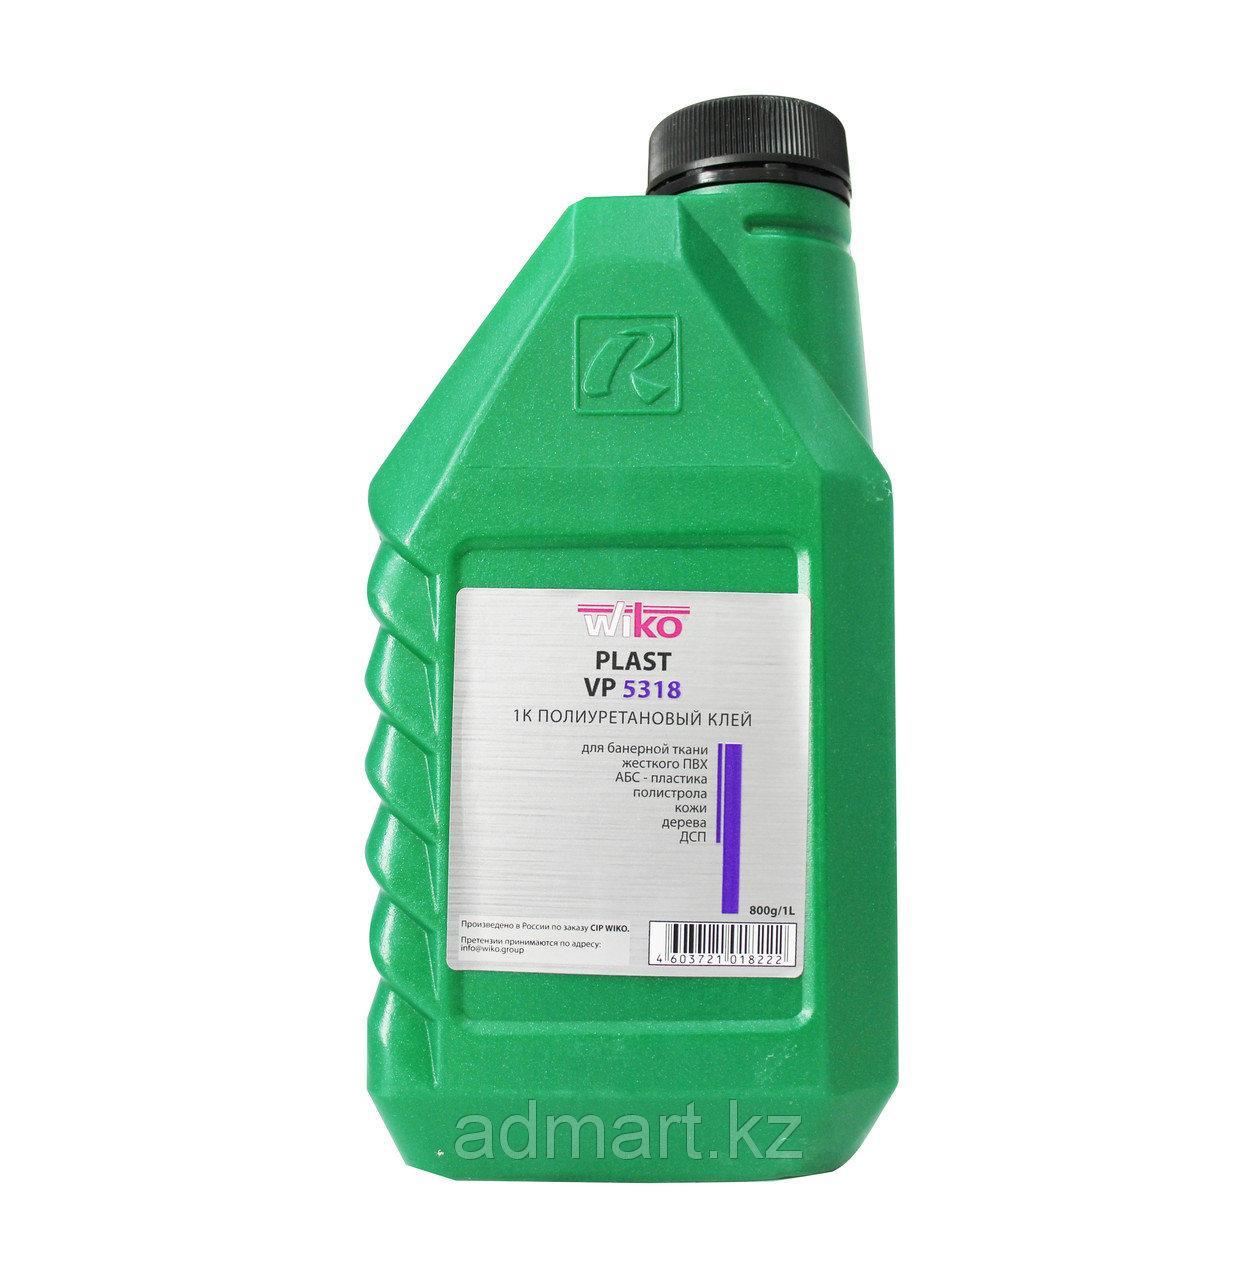 Клей WIKO Plast VP 5318 (800 г)